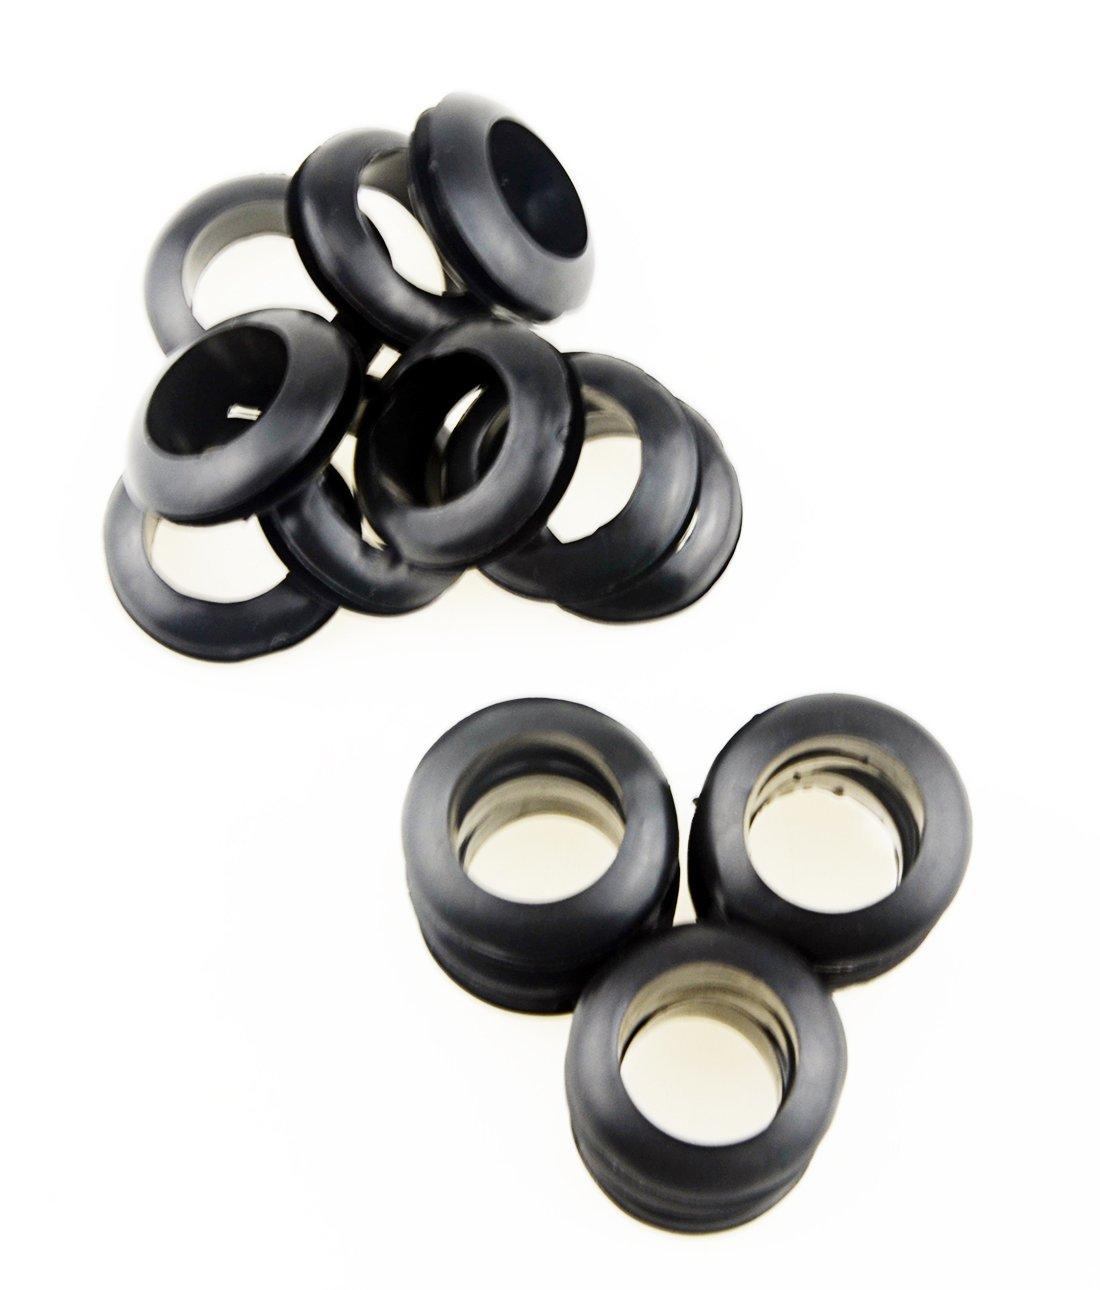 Cheap Ppap Wiring Rubber Grommet Find Grommets Get Quotations Xlx 100p M10 Assortment Coil Wire Gasket Kit